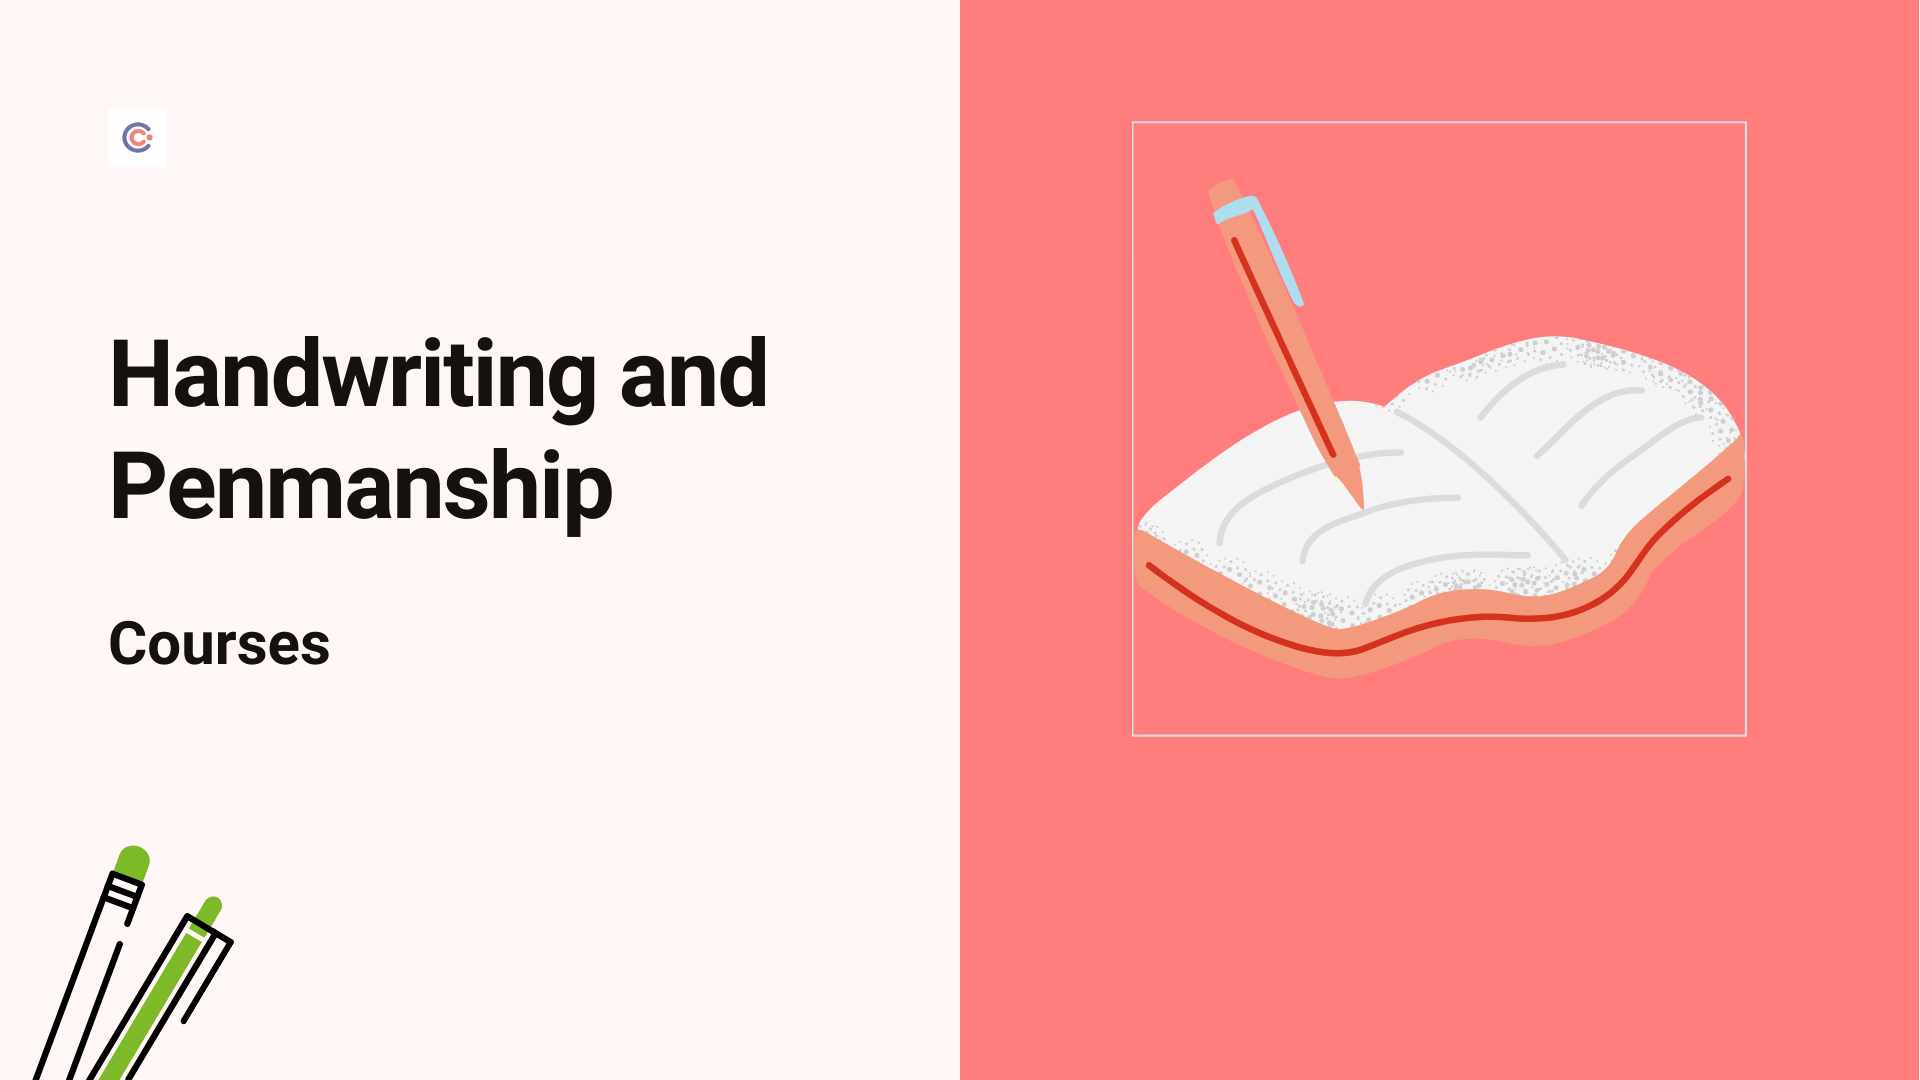 7 Best Handwriting + Penmanship Courses - Learn Penmanship Online